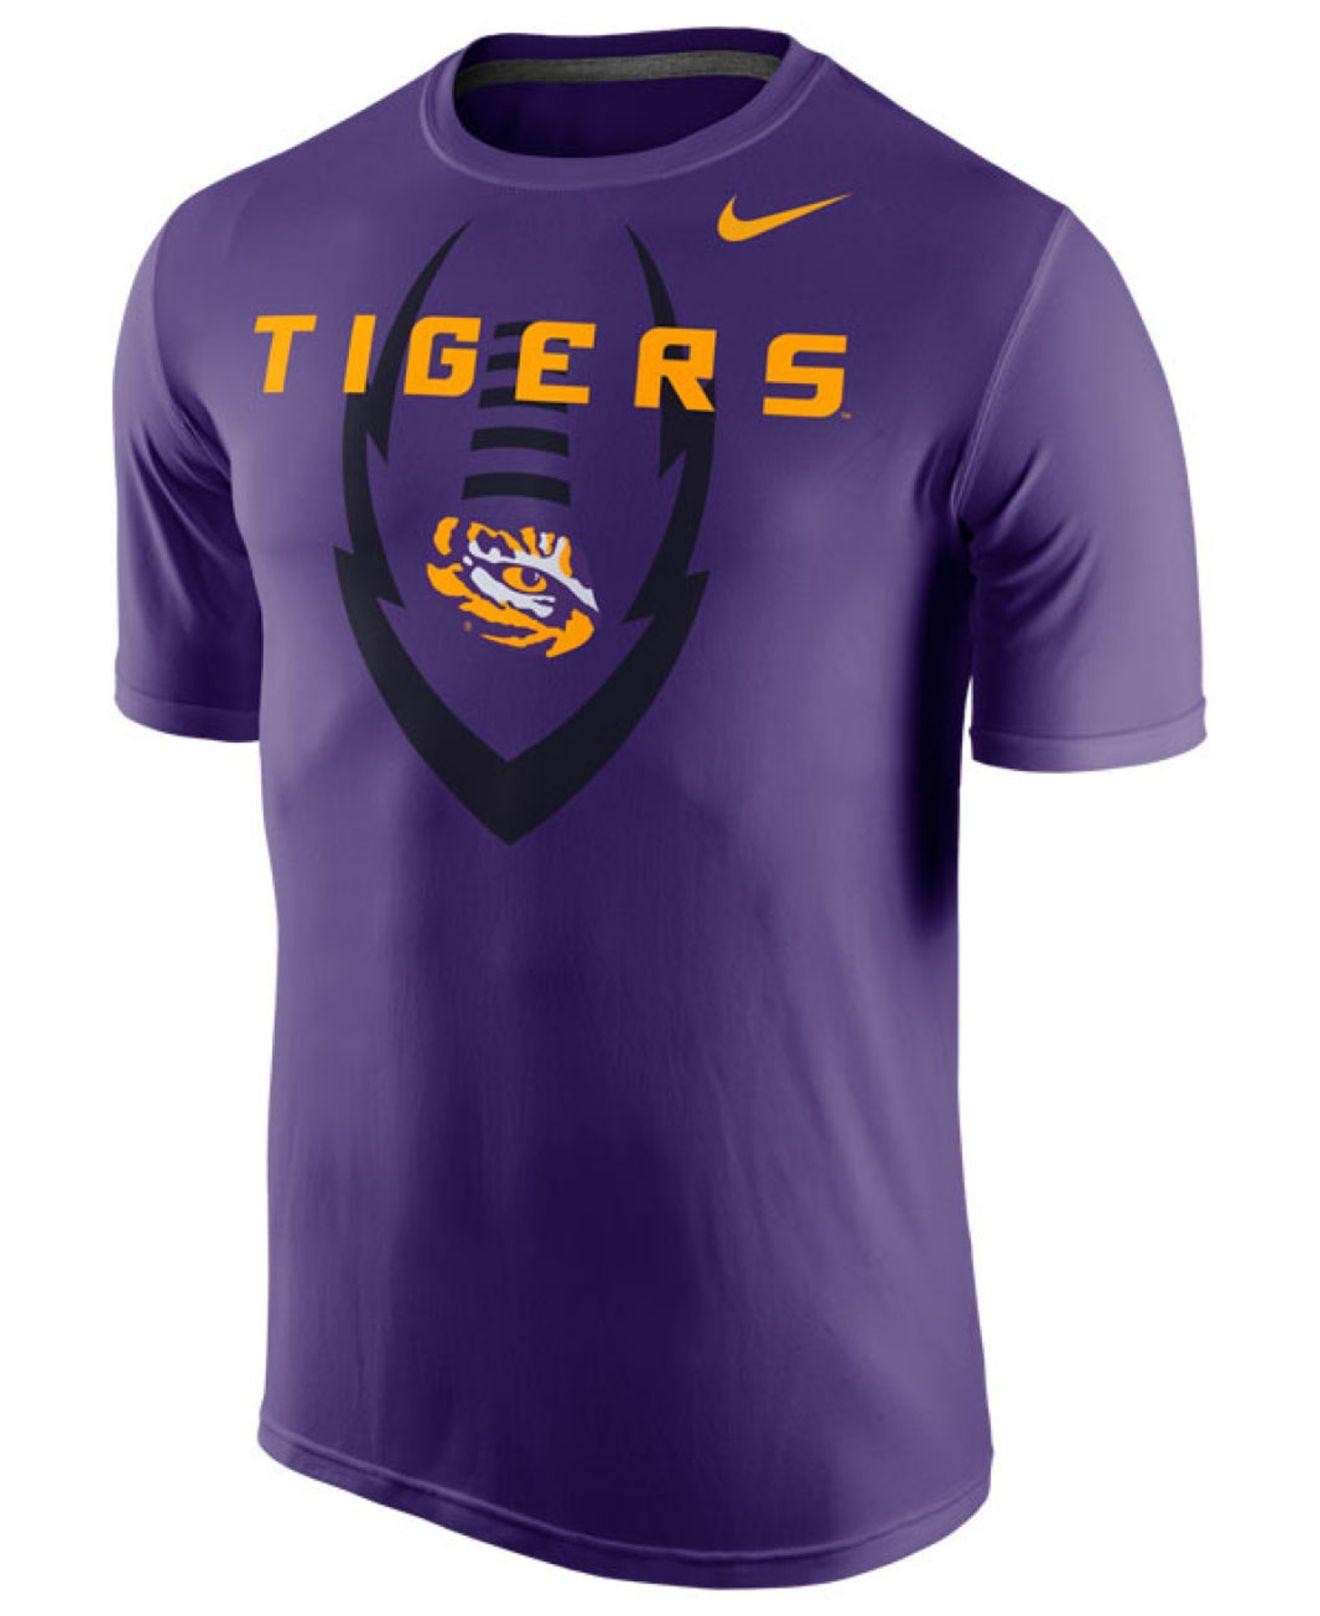 Mens Nike Swoosh T Shirt